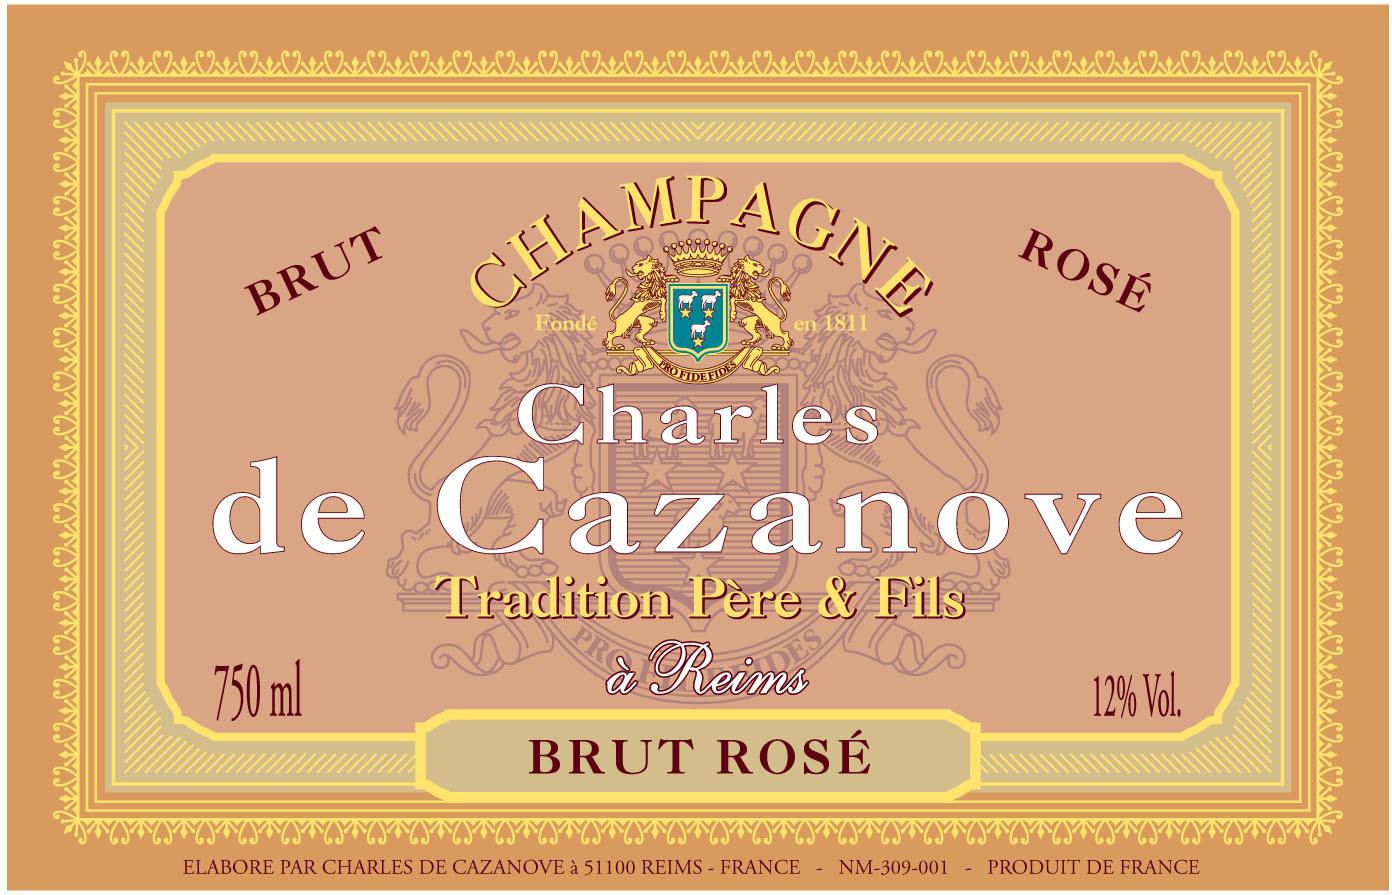 charles de cazanove millesime brut champagne blend (champagne)